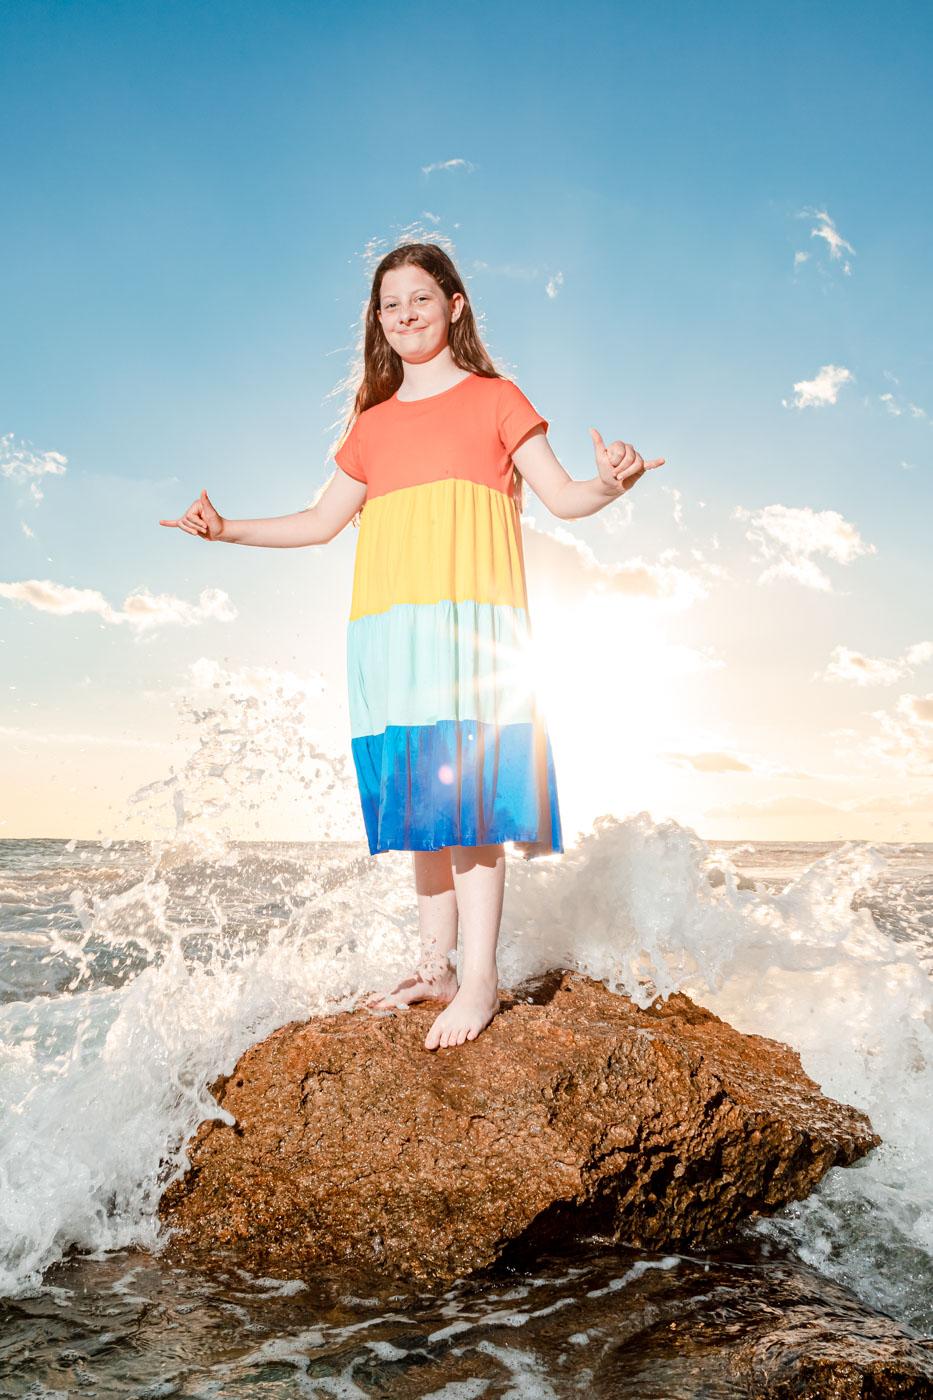 senior kids ocean wave beach oahu hawaii portrait